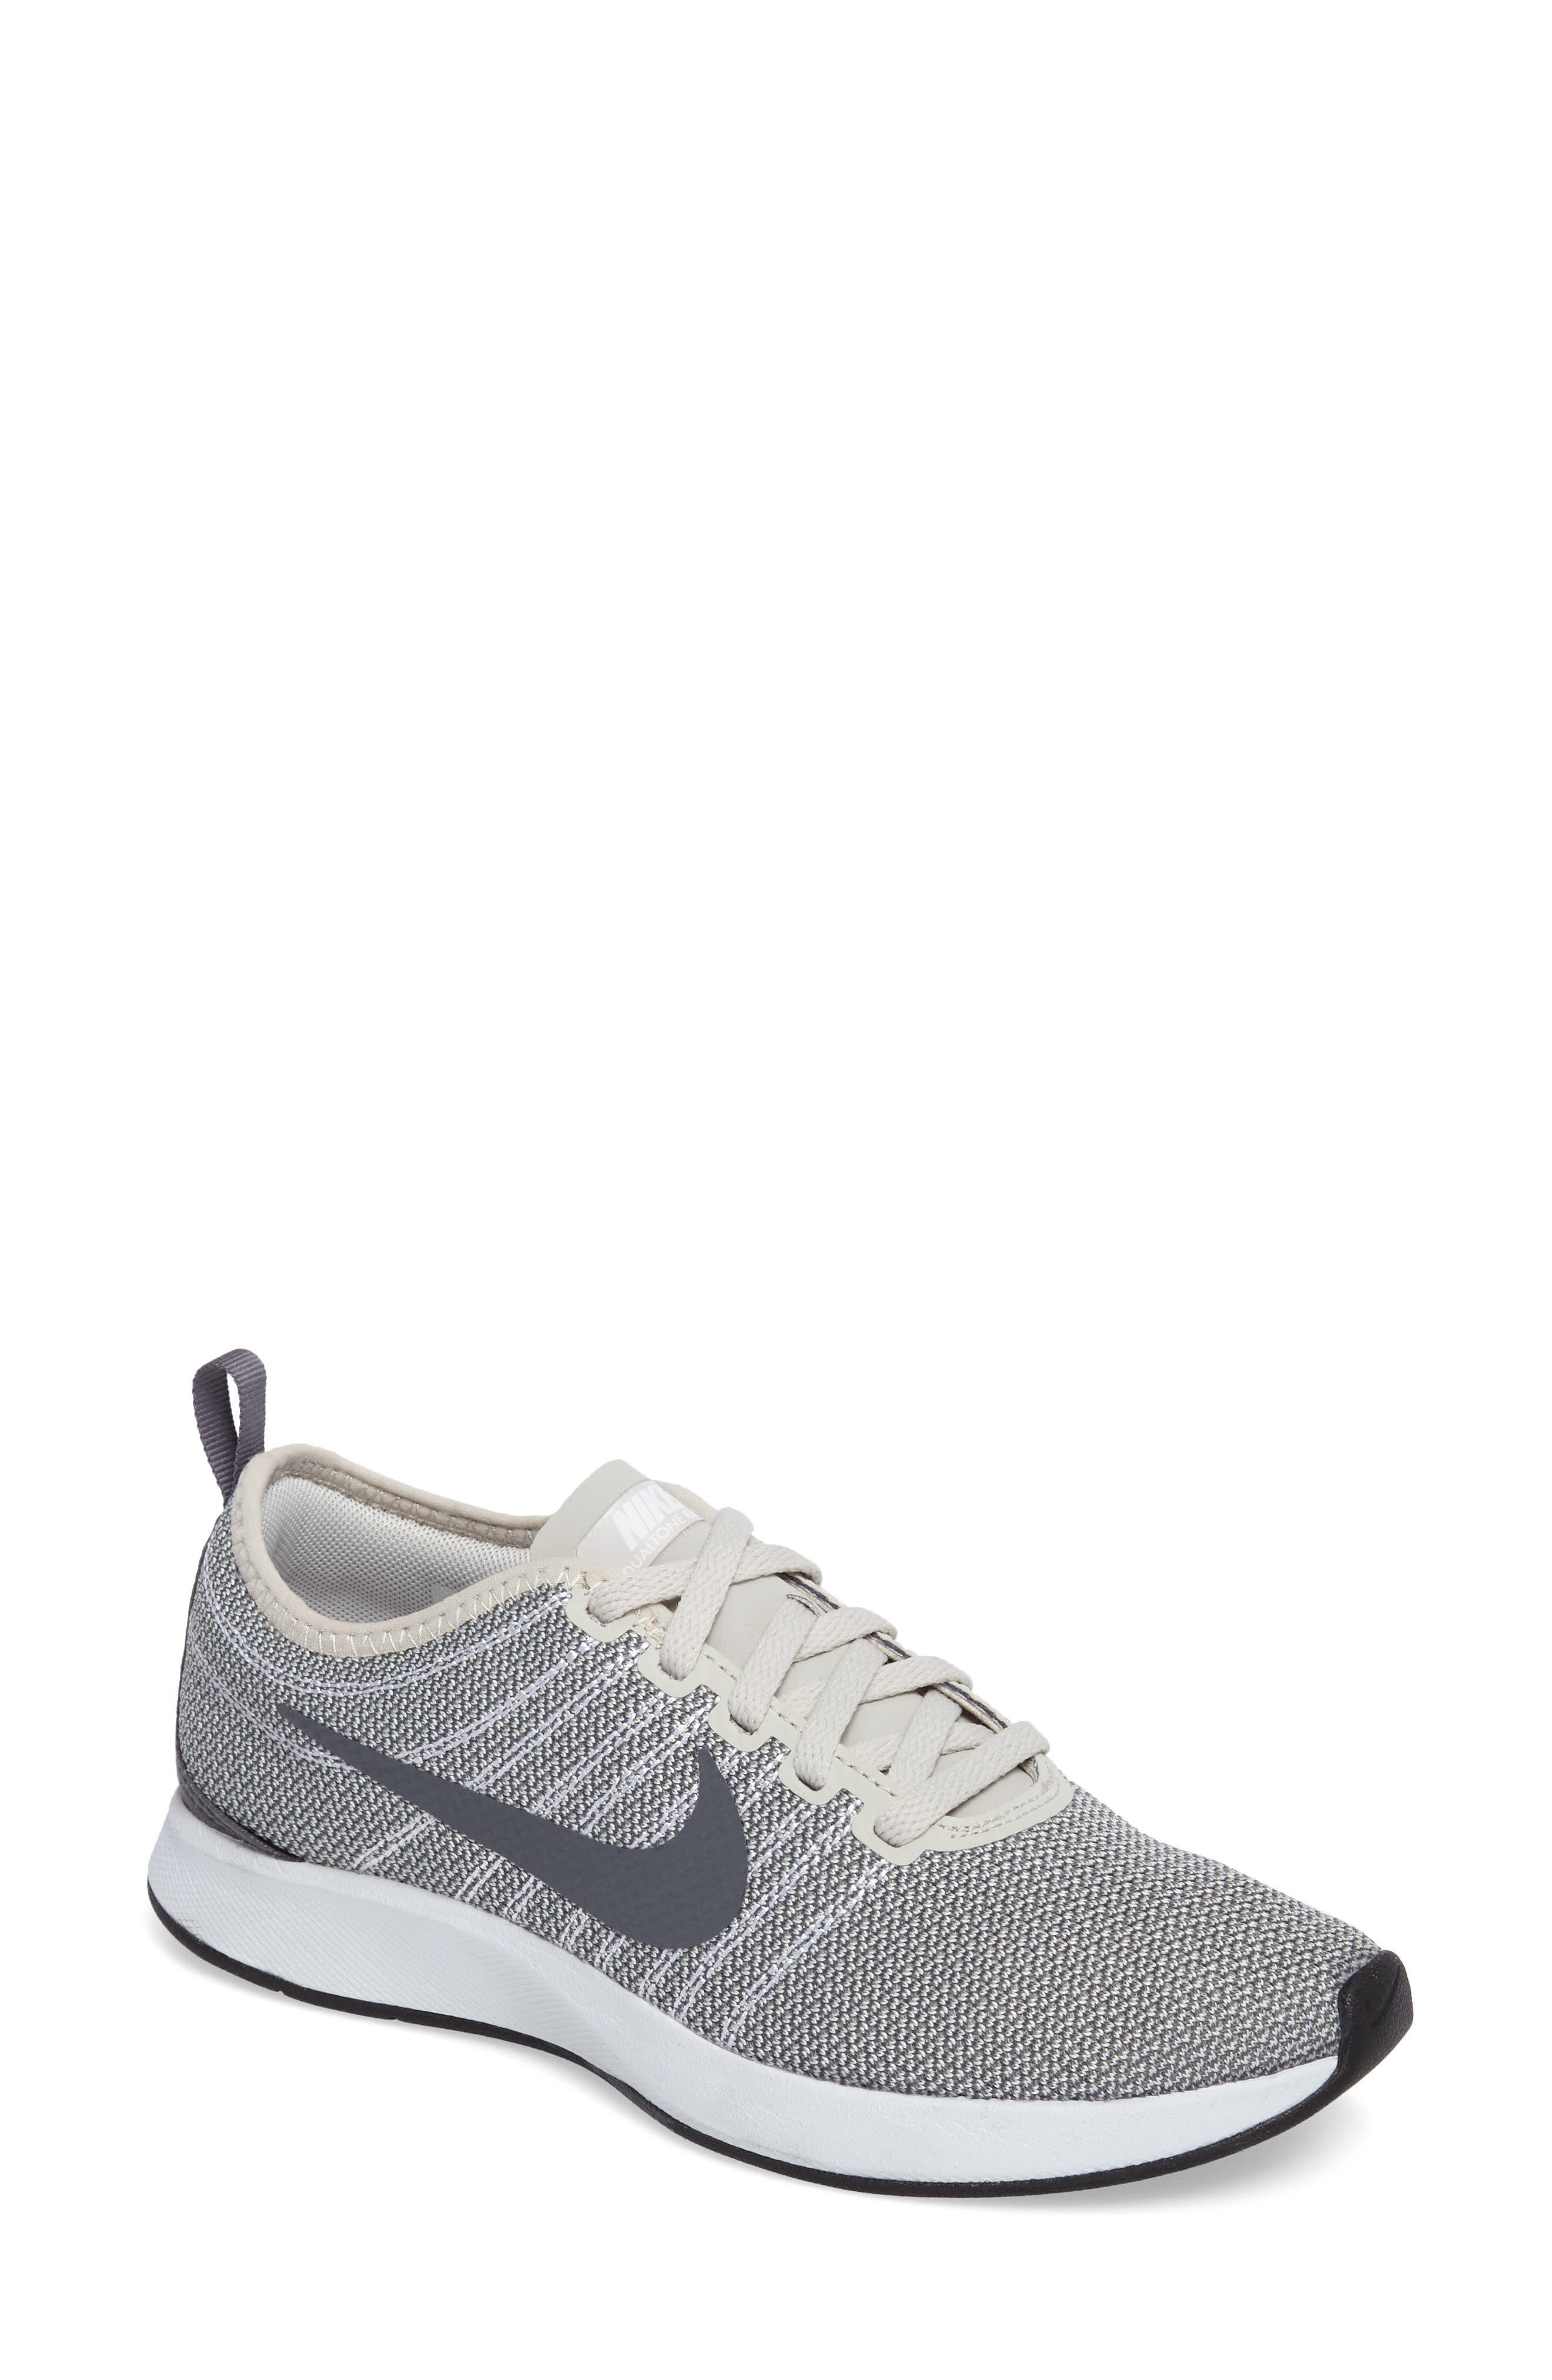 Dualtone Racer Running Shoe,                         Main,                         color, Light Bone/ White/ Dark Grey